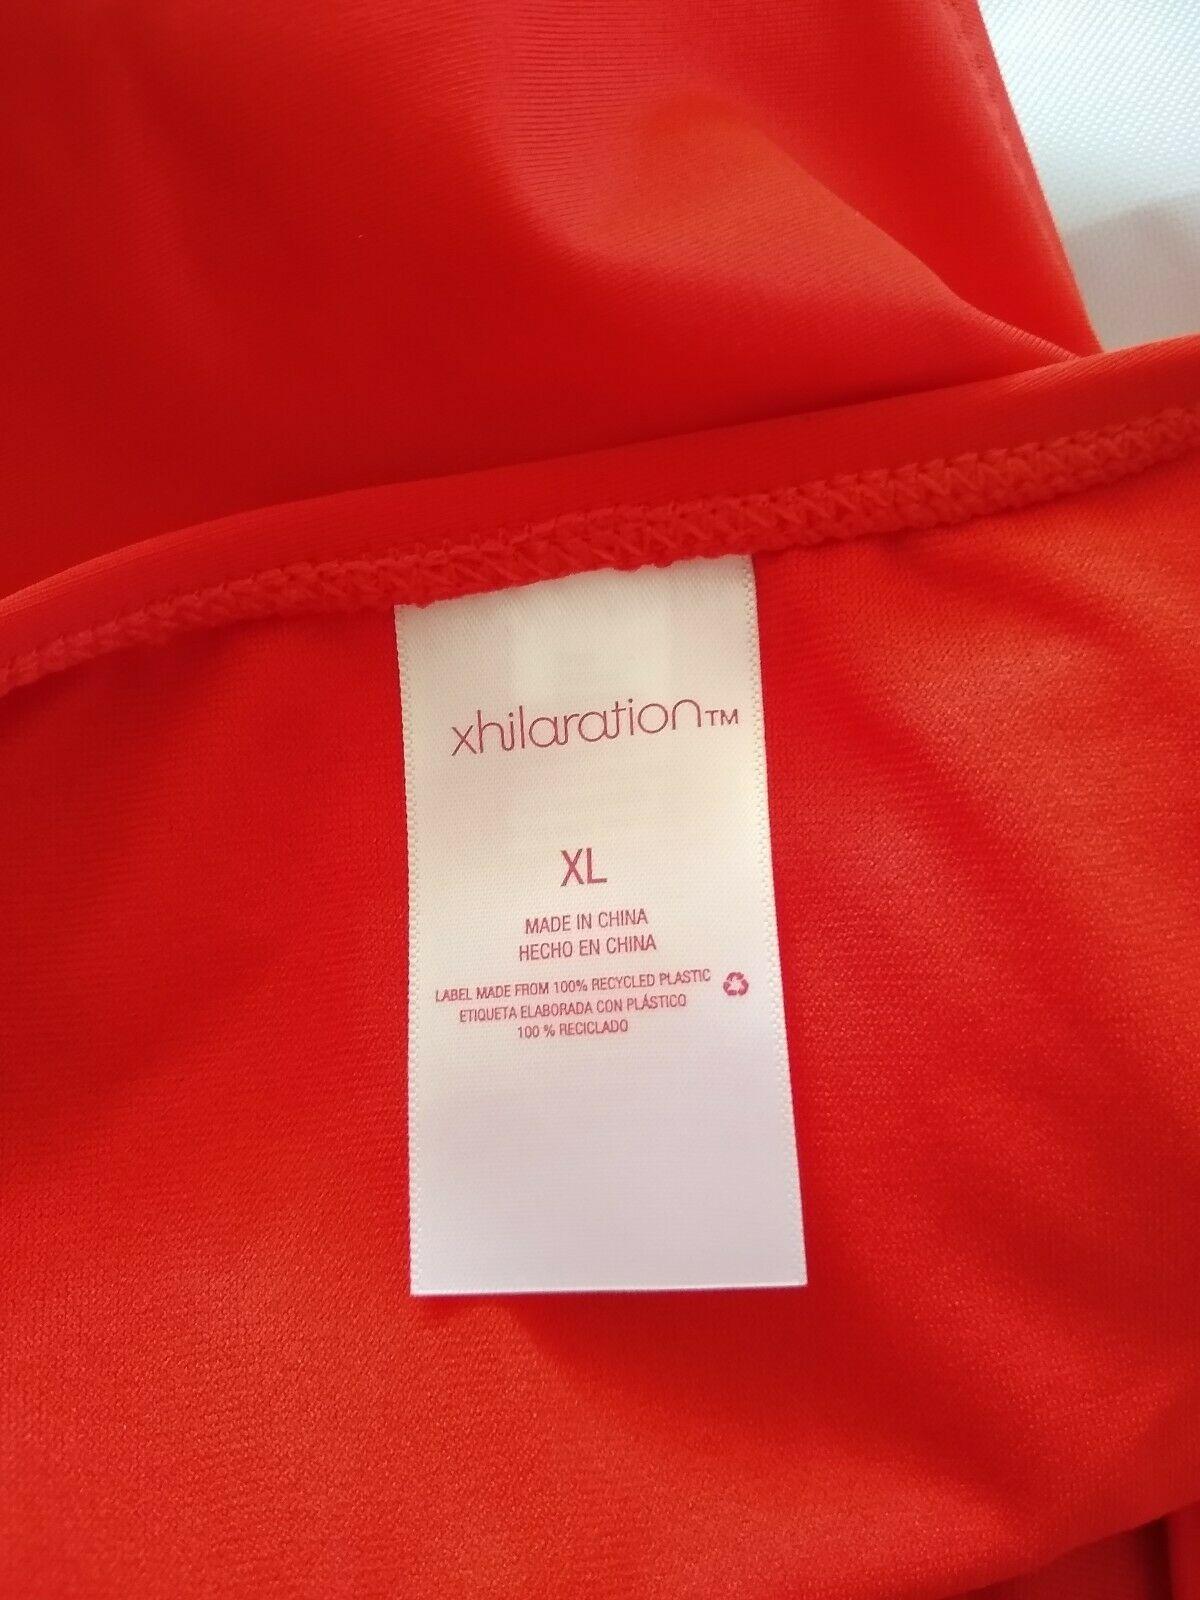 Xhilaration Women's Hipster Red Bikini Bottom Size XL image 9